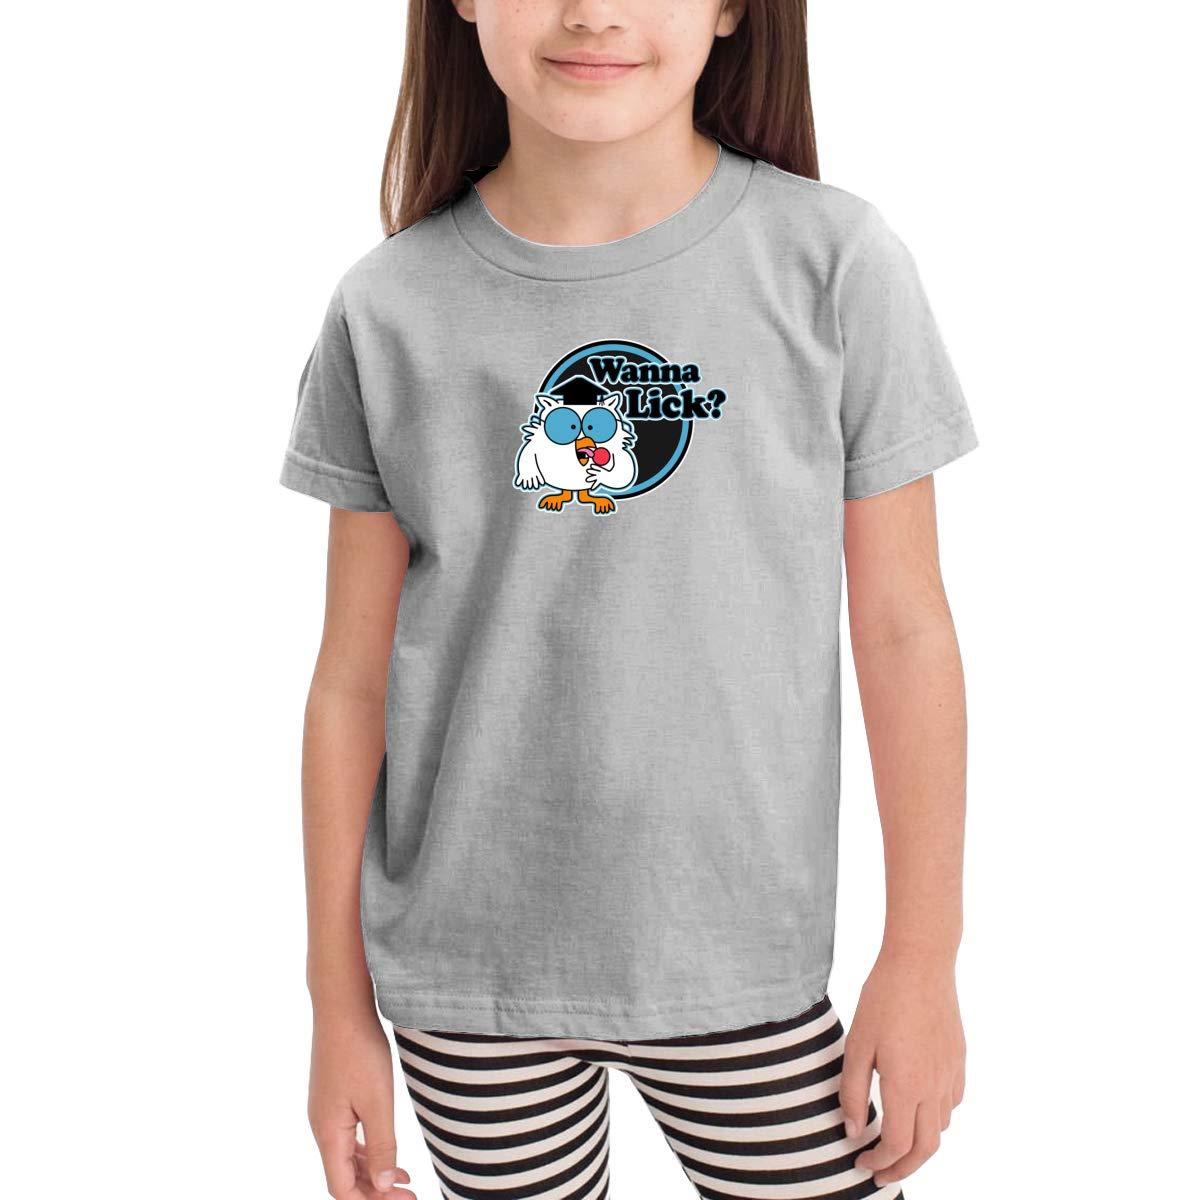 CY SHOP Green Python Snake Childrens Boys Girls Contrast Short Sleeve T-Shirt